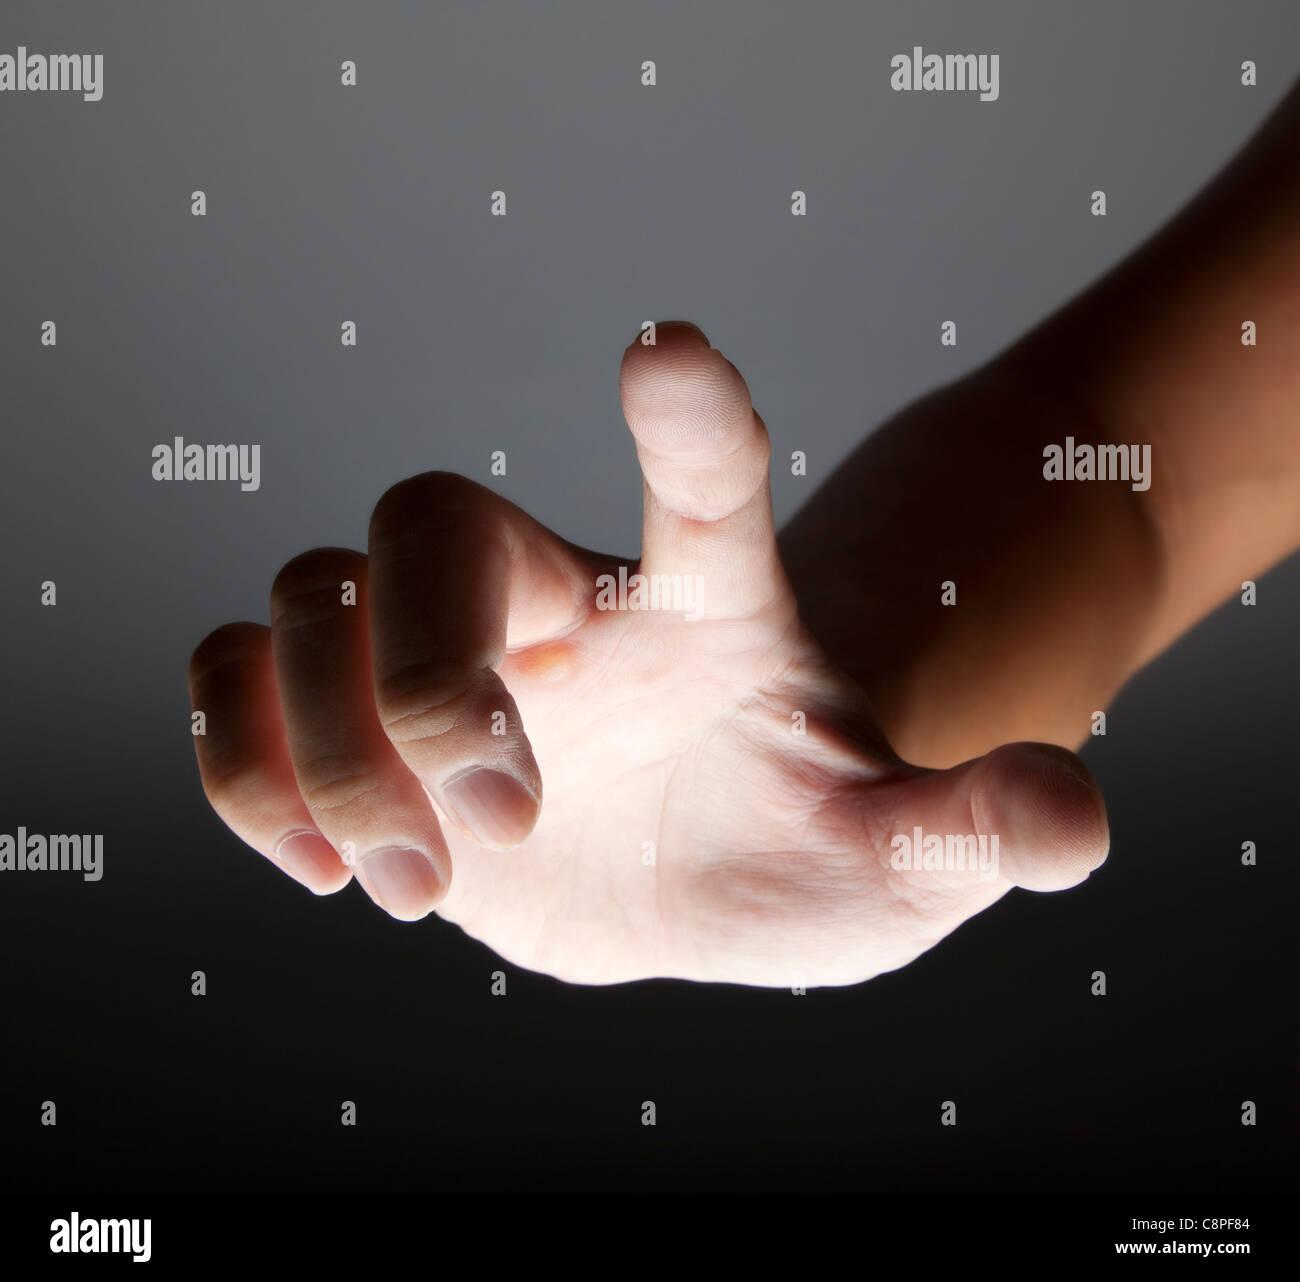 Hand zu berühren im Dunkeln Stockbild